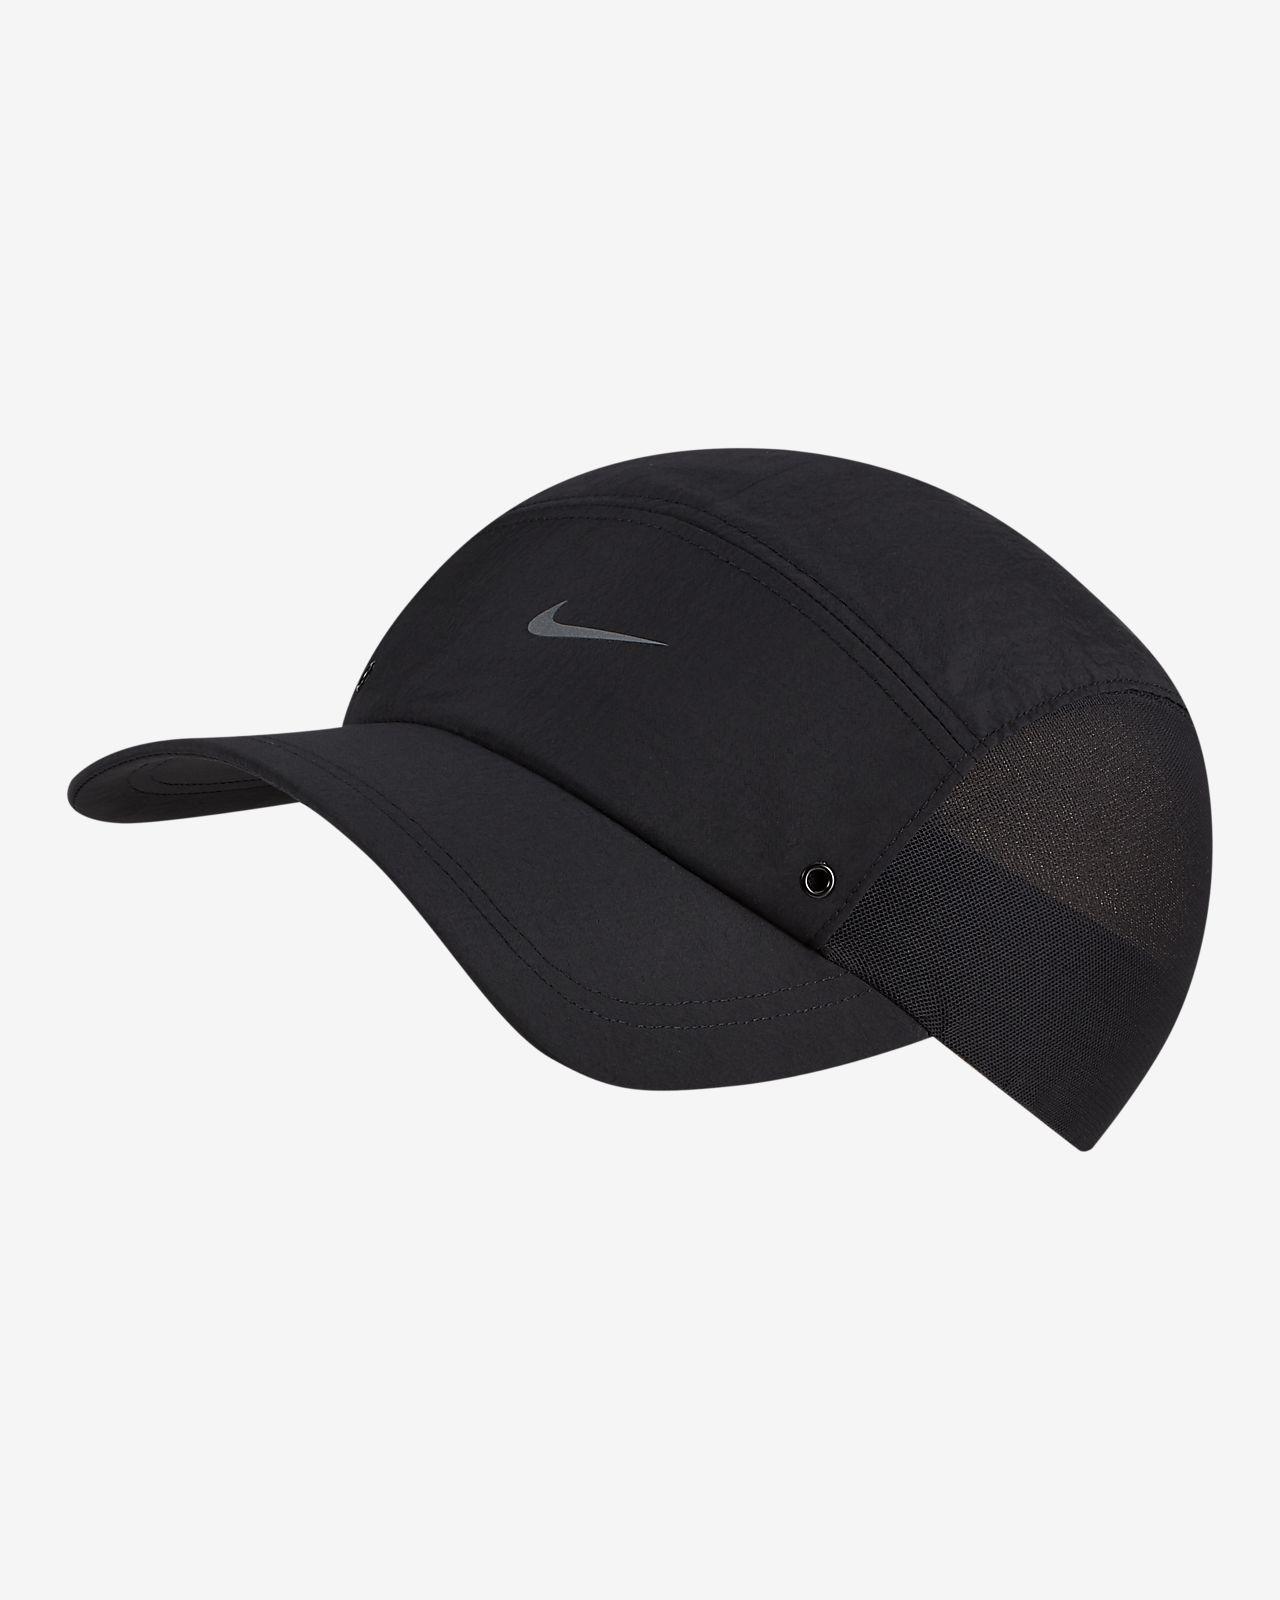 722a1203a5d Nike x A-COLD-WALL  AW84 Cap. Nike.com GB